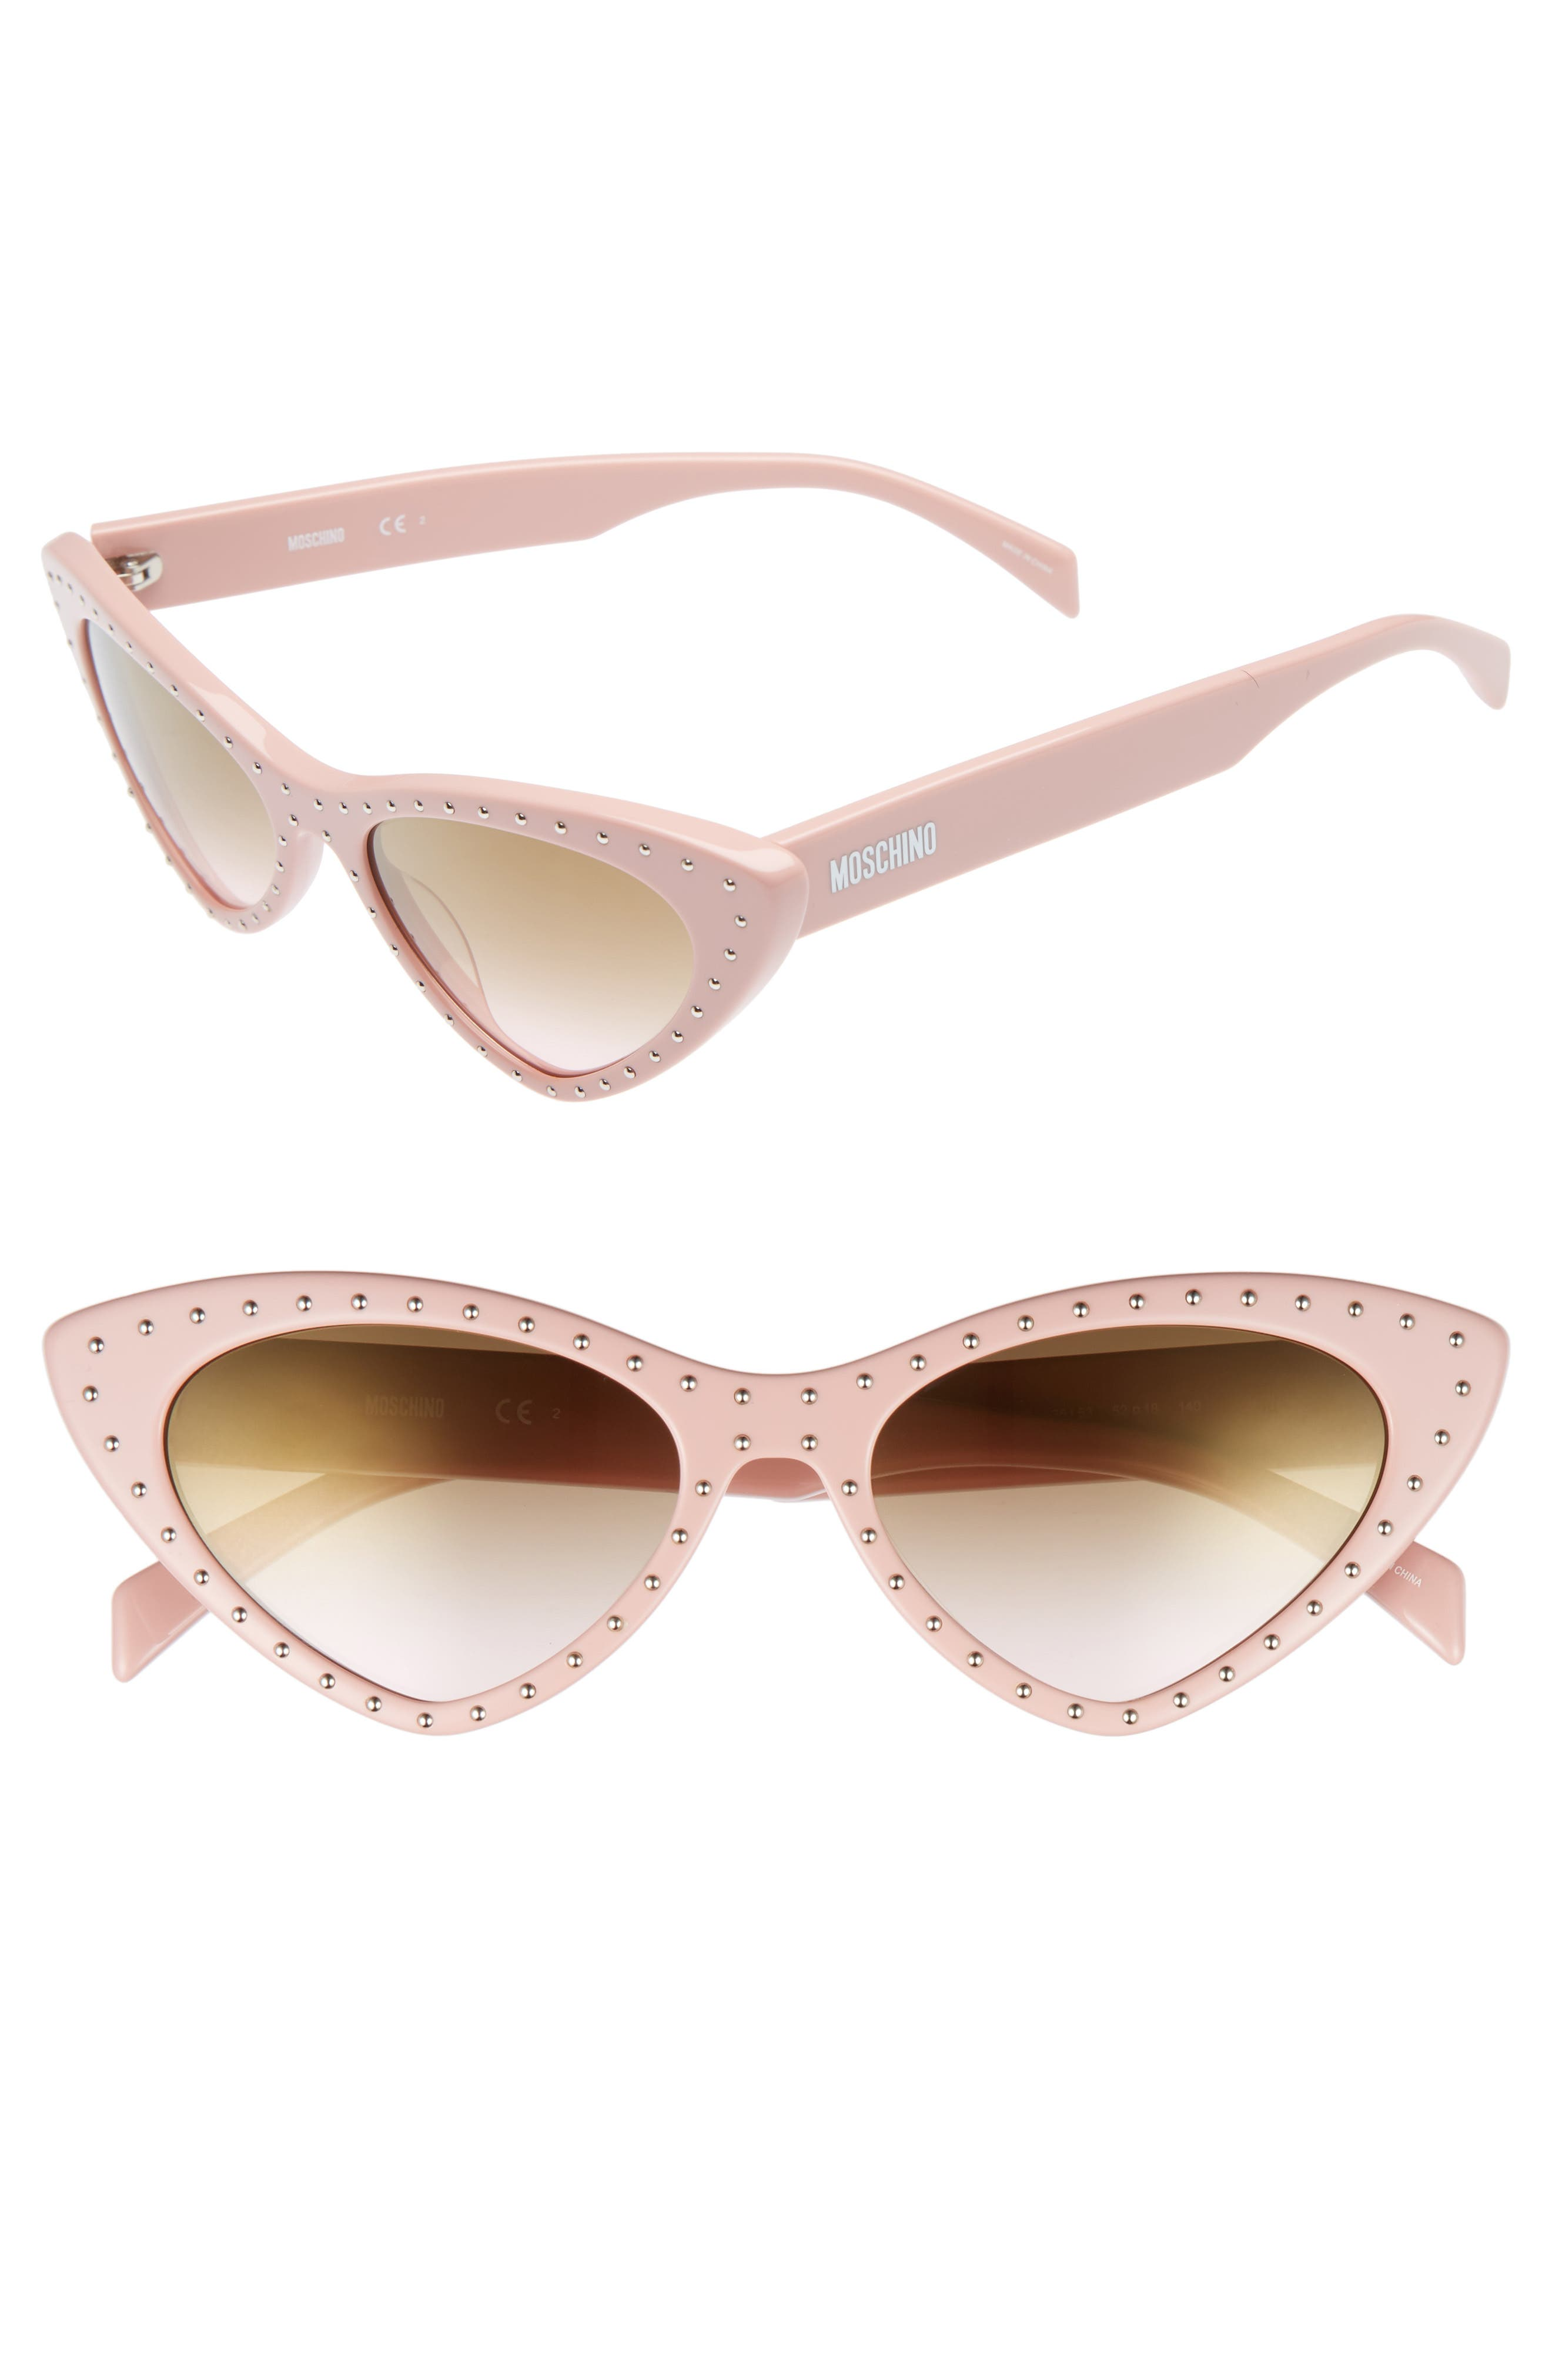 1950s Glasses, Sunglasses History for Women Missoni 52mm Cat Eye Sunglasses Size NONE - Pink at Nordstrom Rack $79.97 AT vintagedancer.com